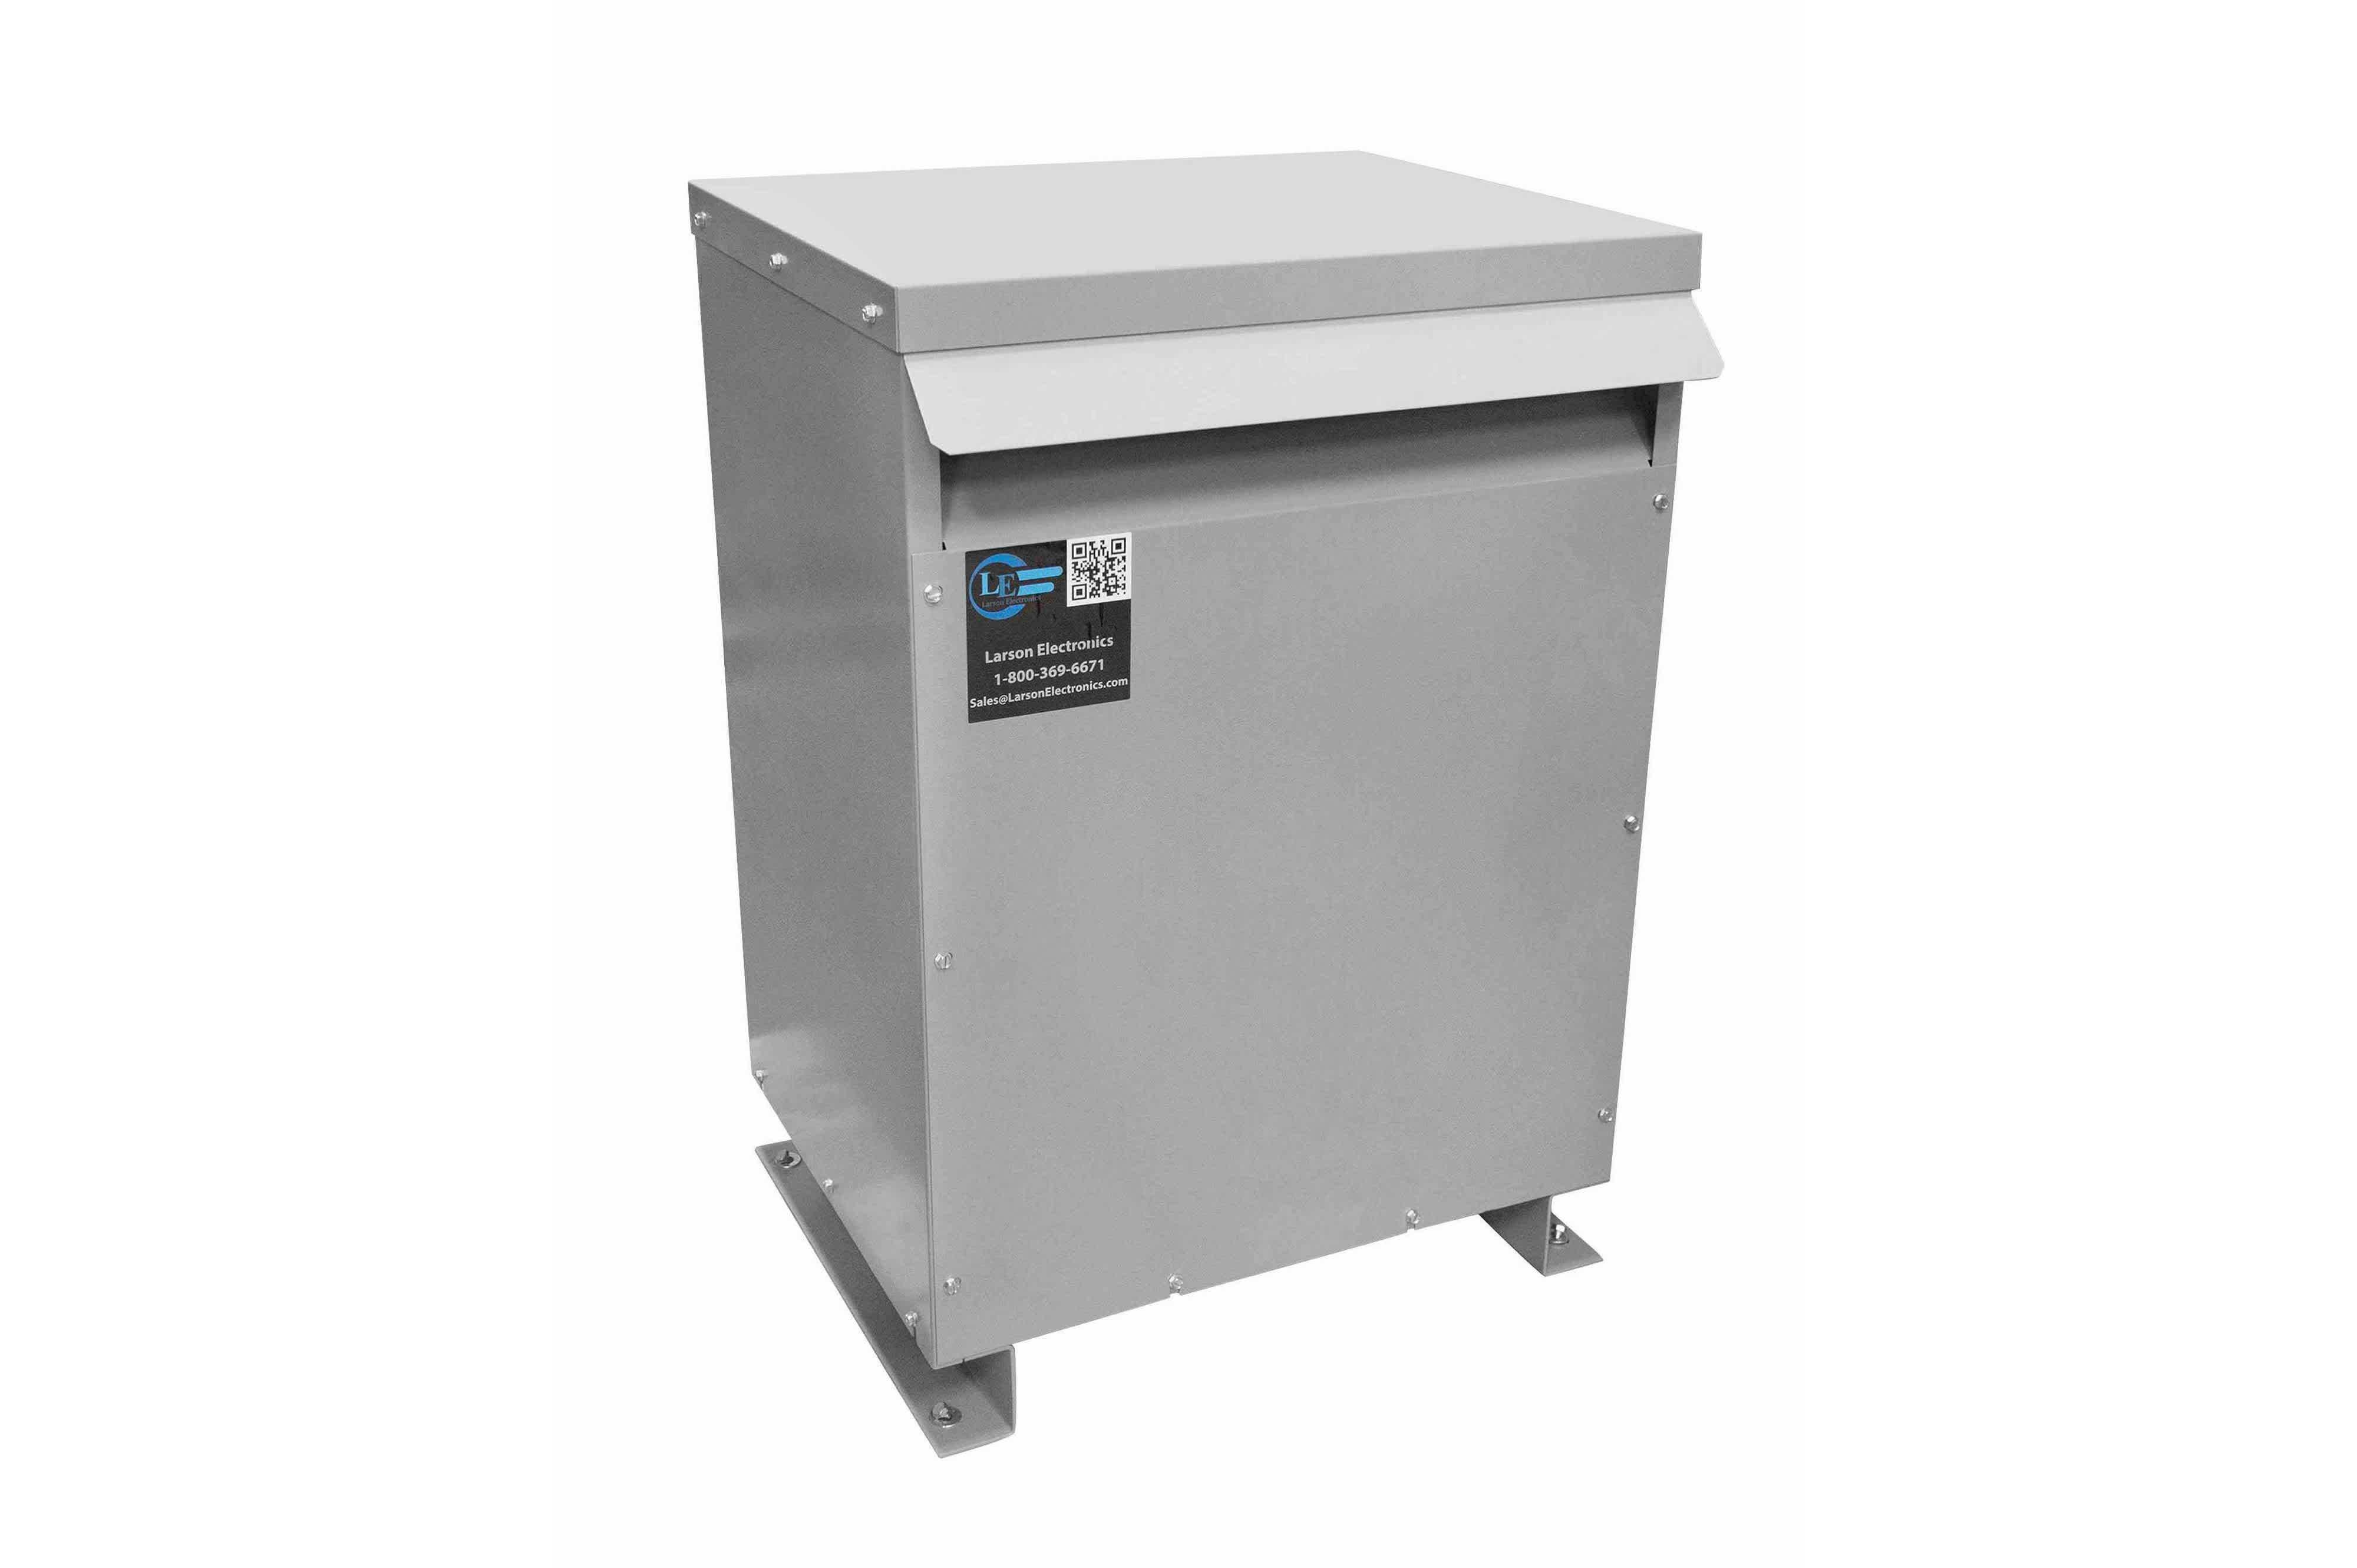 115 kVA 3PH Isolation Transformer, 208V Wye Primary, 480Y/277 Wye-N Secondary, N3R, Ventilated, 60 Hz